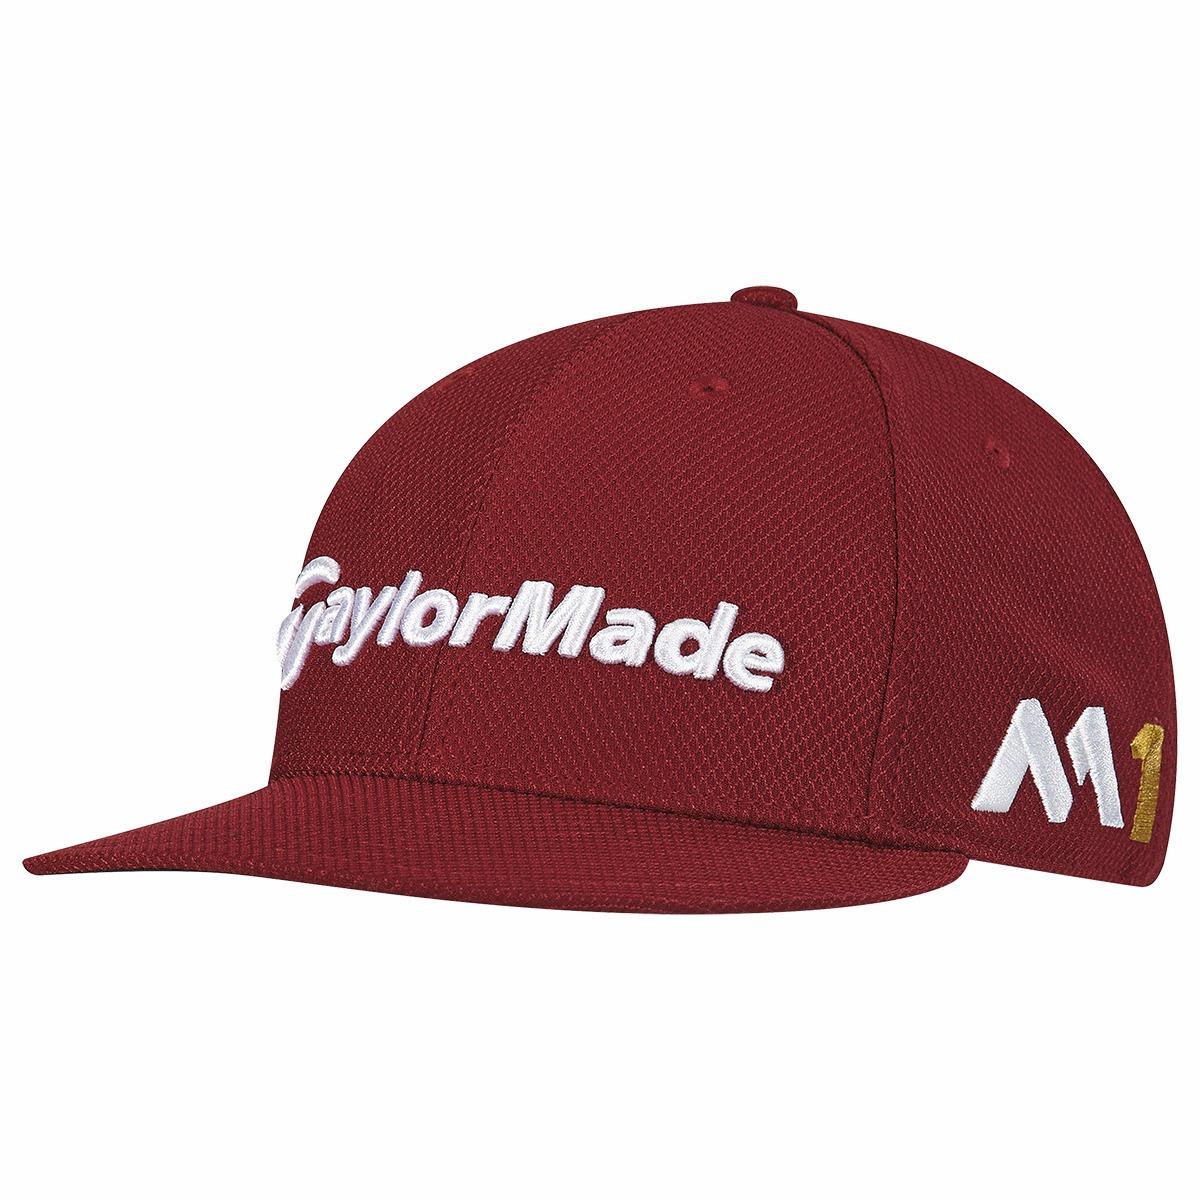 14d05c408731f TaylorMade New Era Tour 9Fifty M1 Golf Hat Adjustable Snapback 2016 Cap